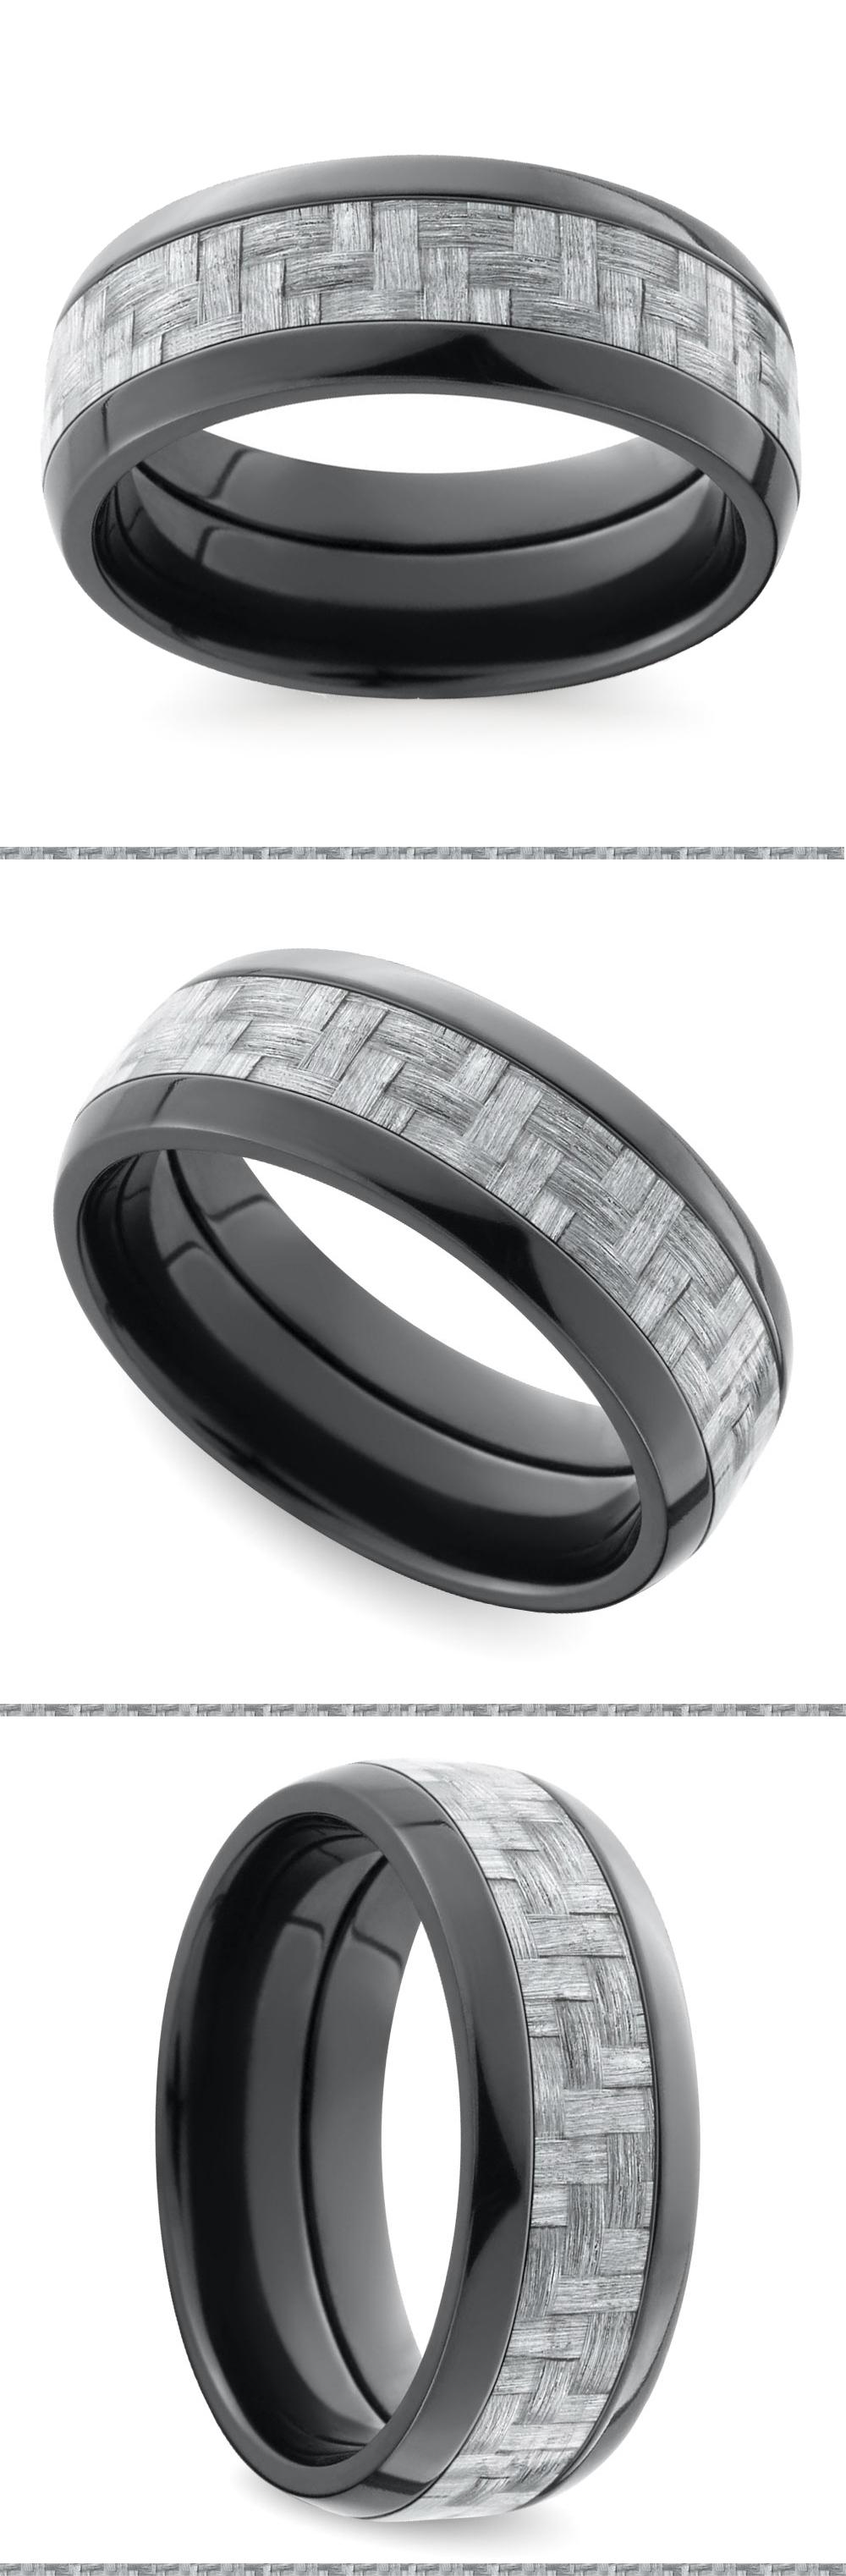 Brilliant Bijou Titanium Polished w//Black Carbon Fiber Inlay 6mm Band